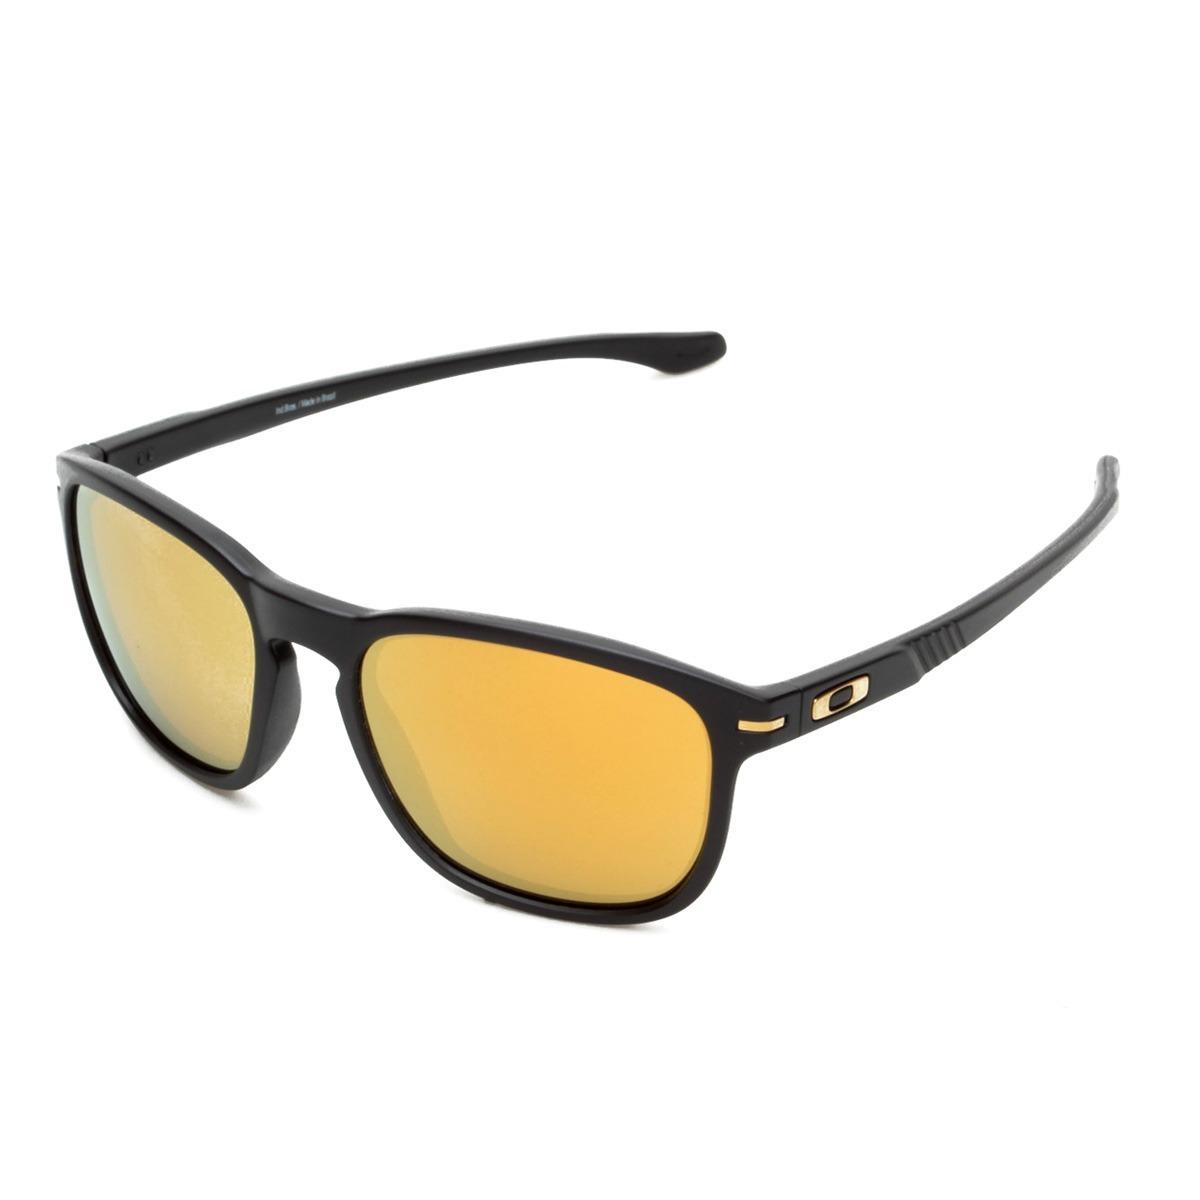 4ac9599f878cb Óculos De Sol Oakley Enduro Special Edition (frete Grátis) - R  289 ...